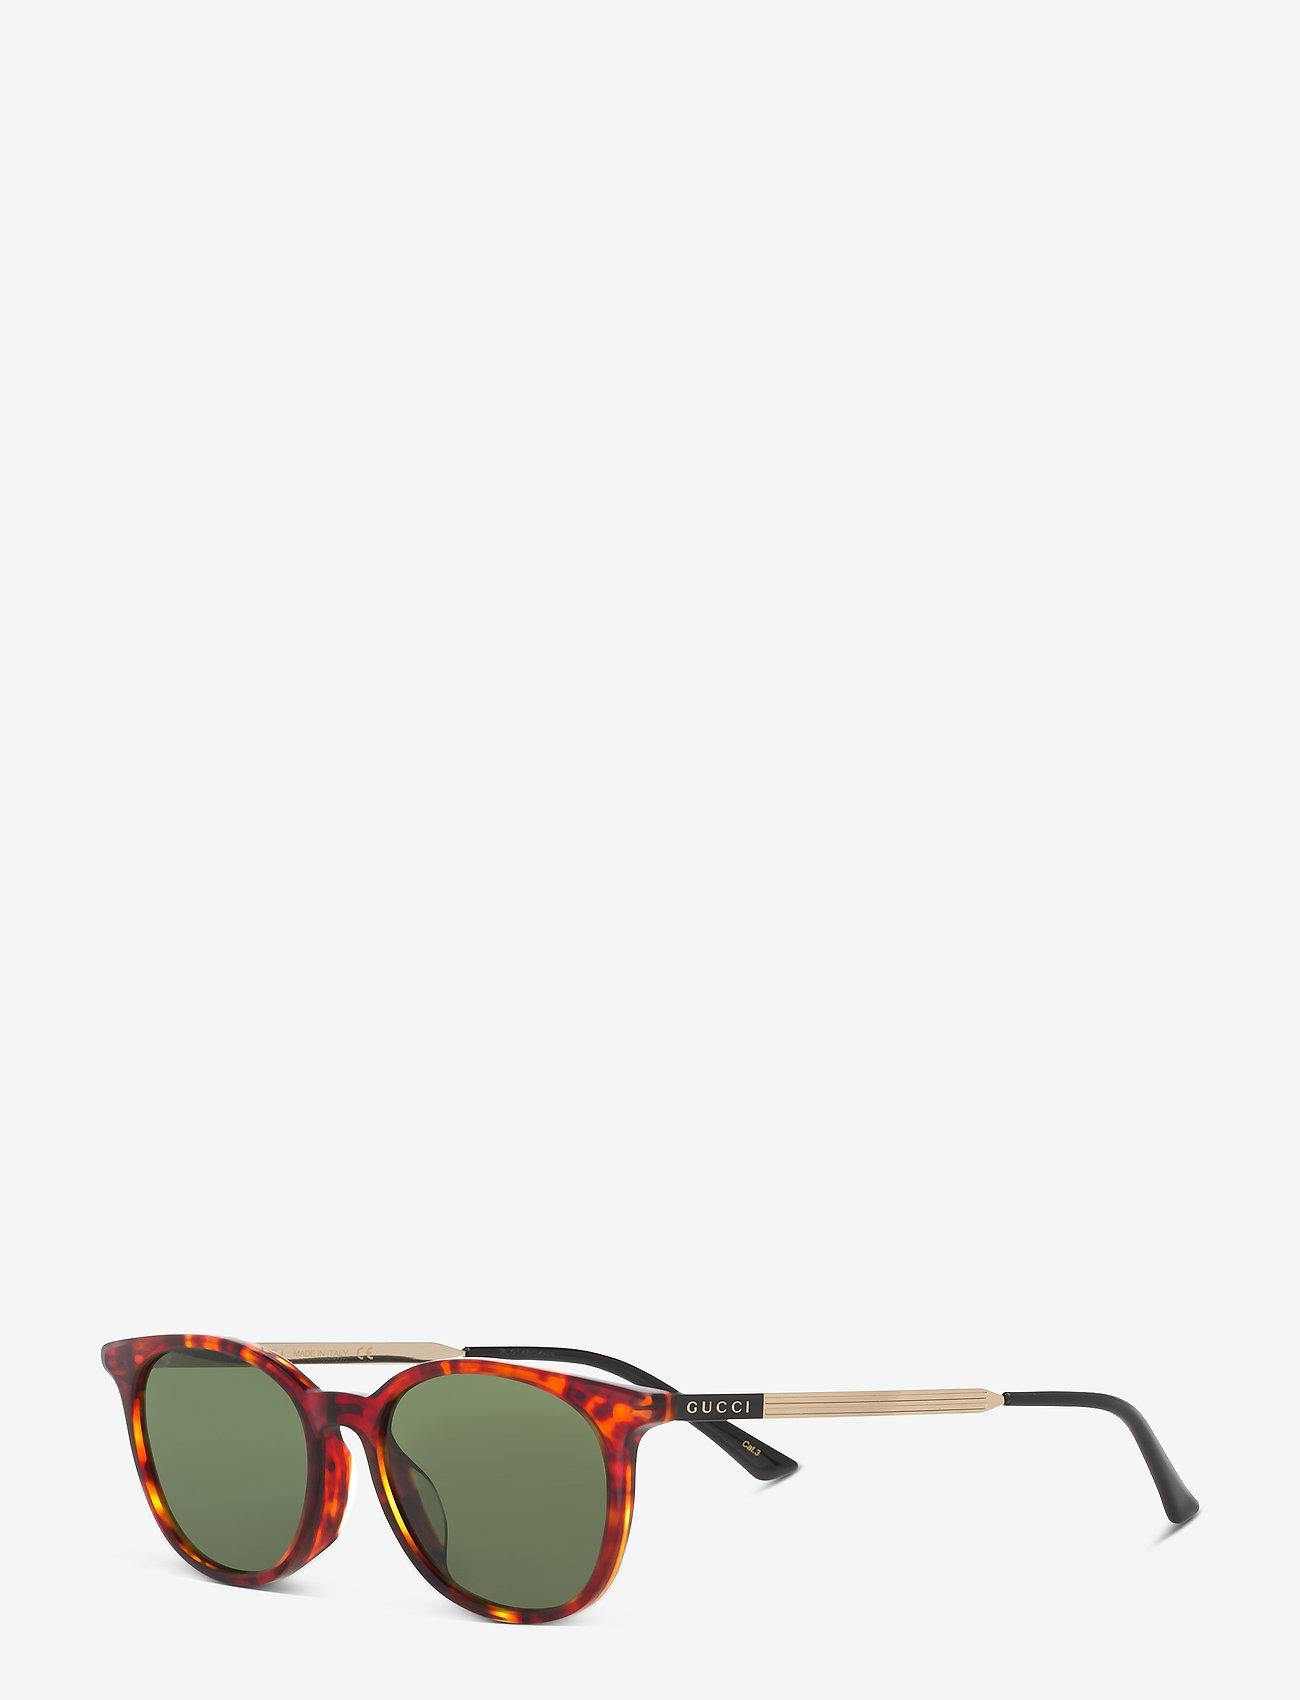 Gucci Sunglasses - GG0830SK - rund ramme - havana-gold-green - 1